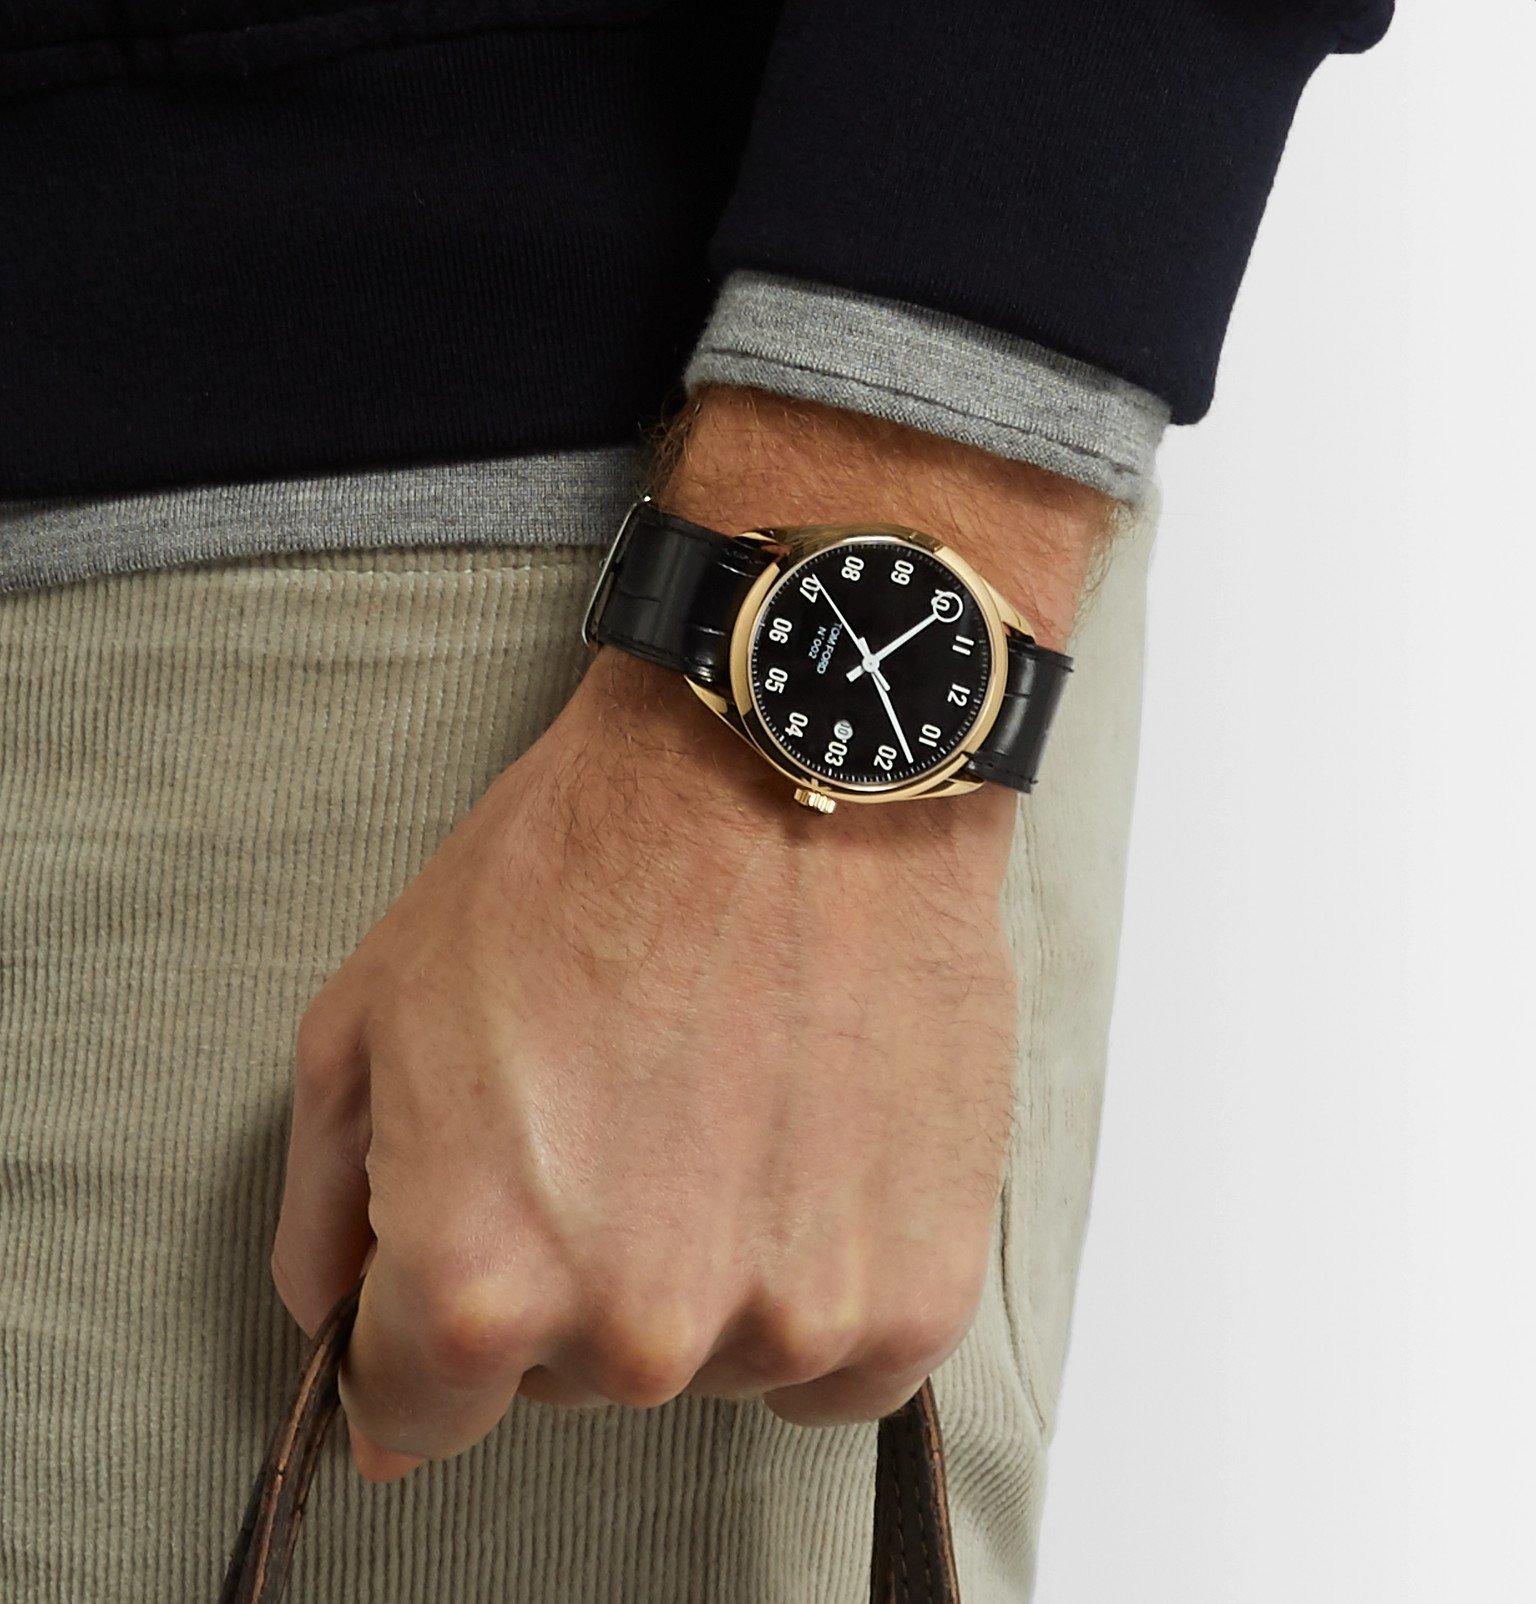 Tom Ford Timepieces - 002 40mm 18-Karat Gold and Alligator Watch - Black